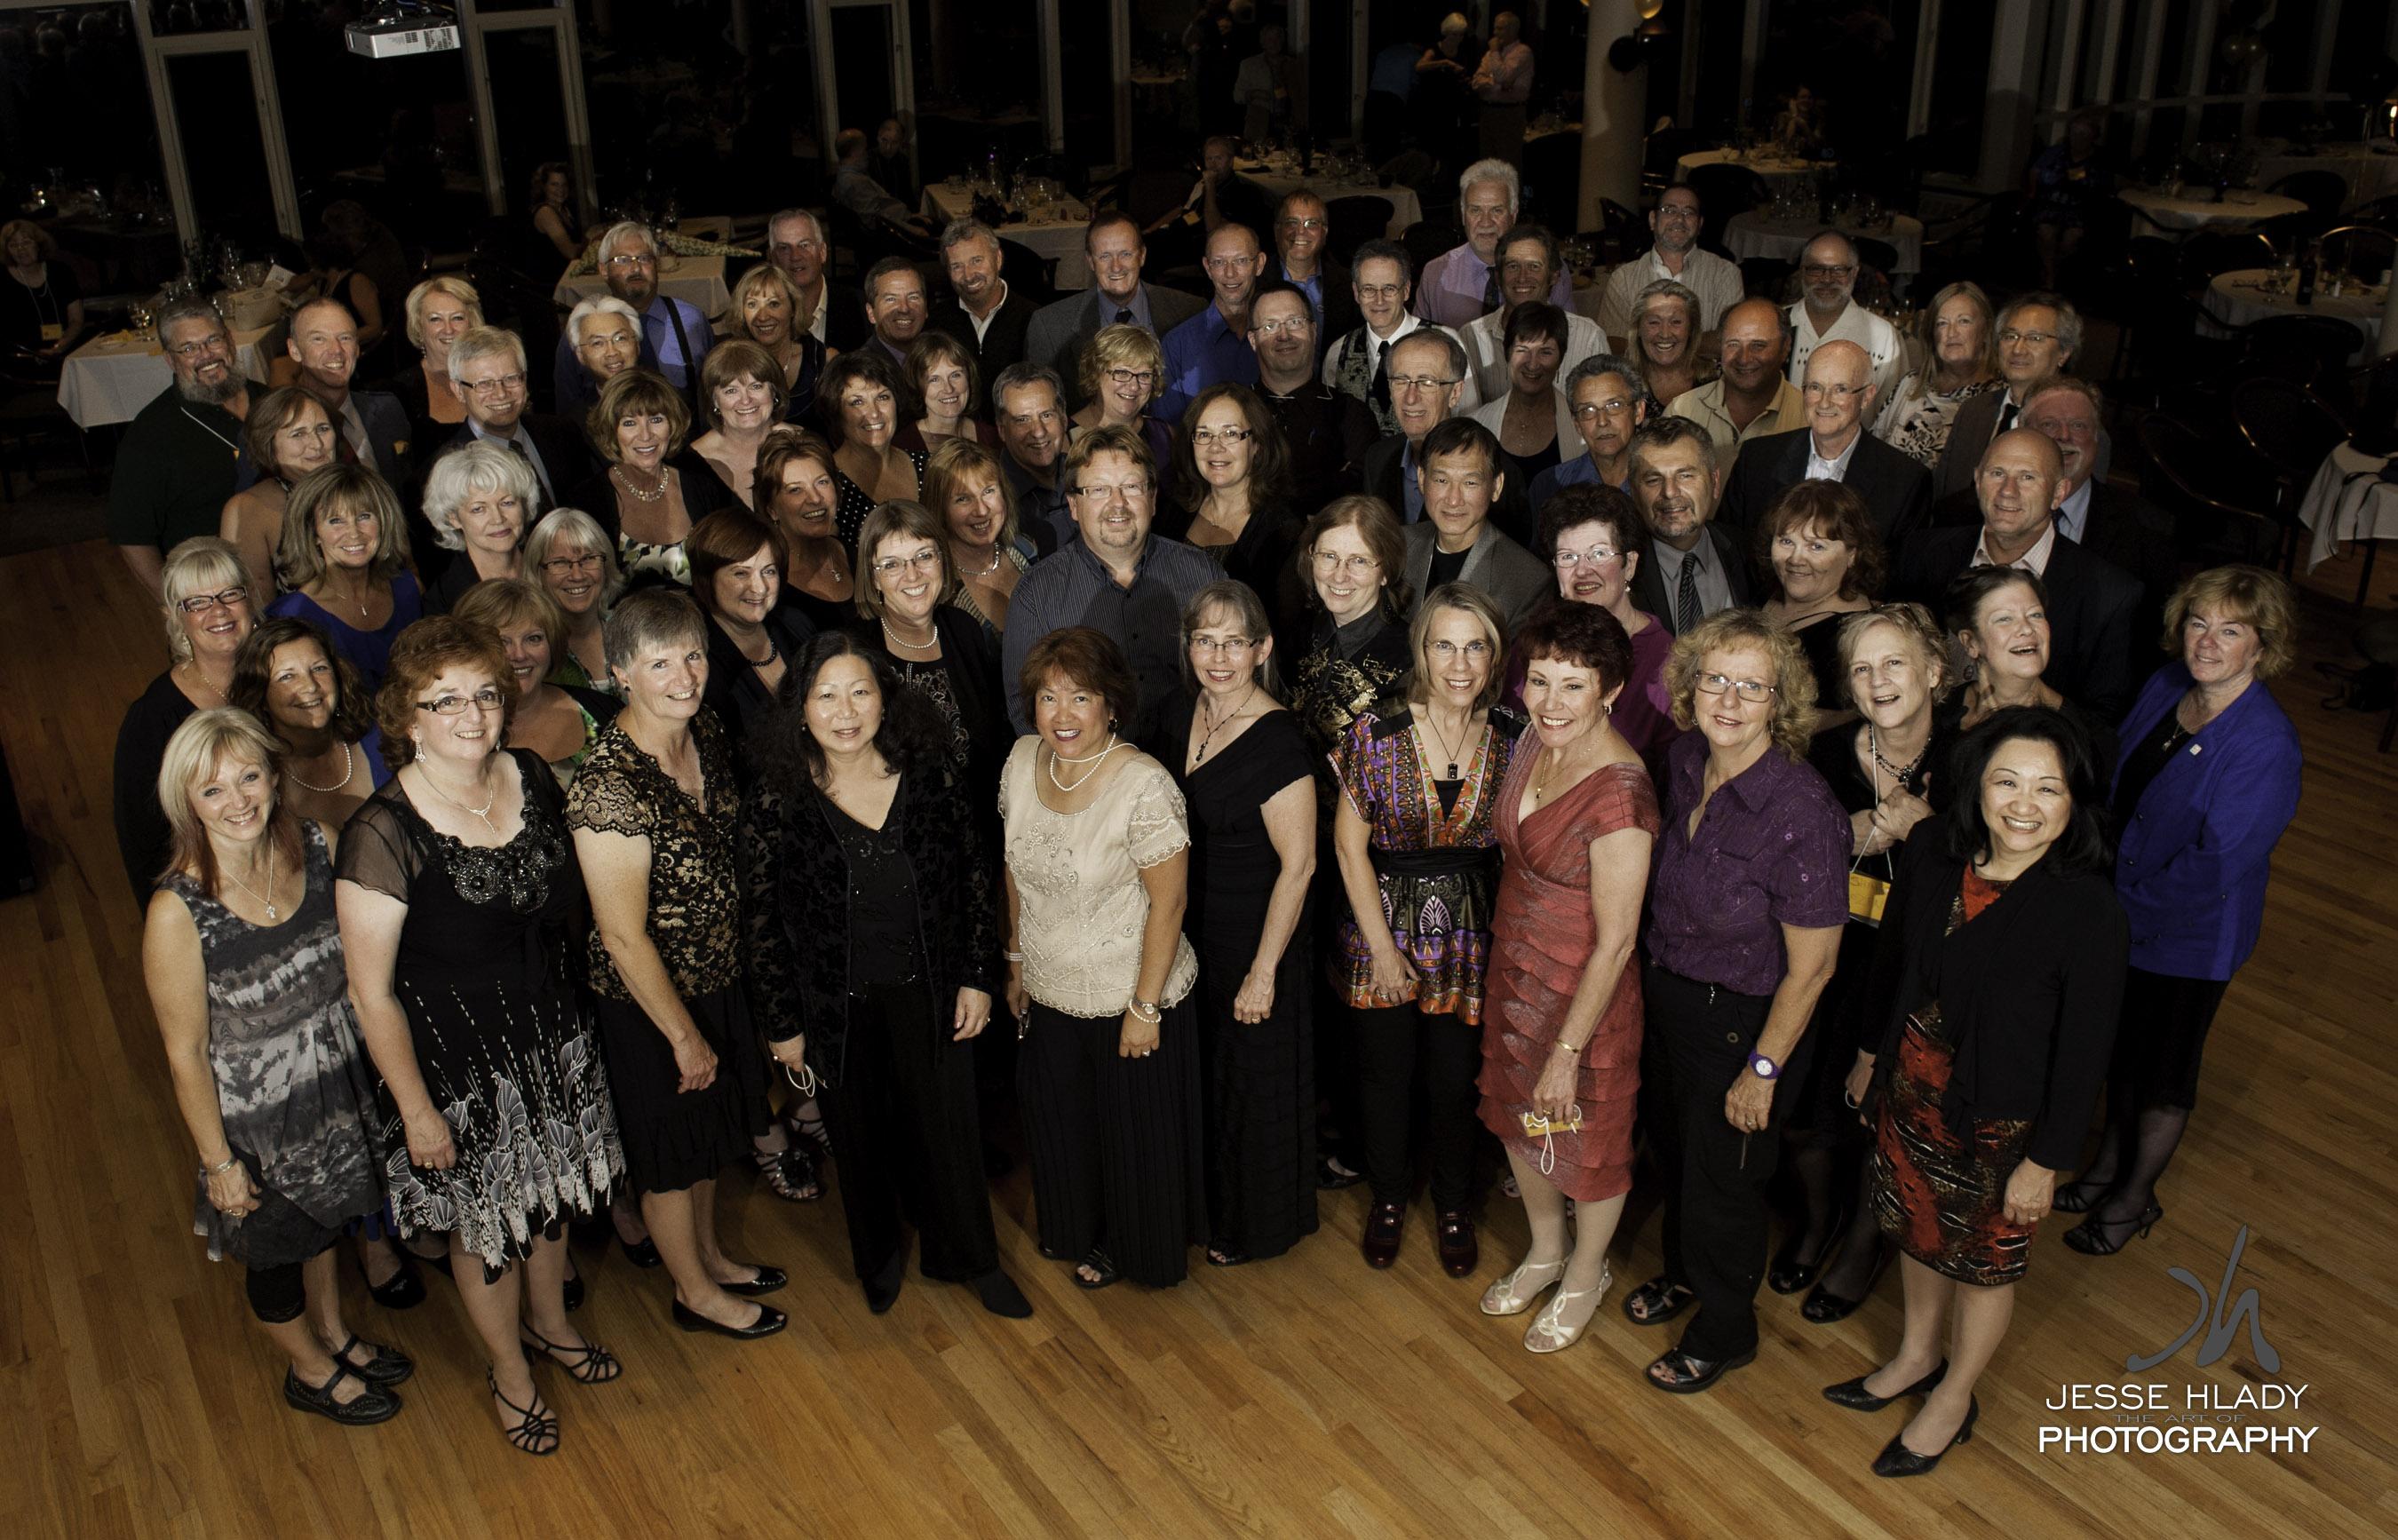 1972 40th Year Reunion Victoria High School Alumni